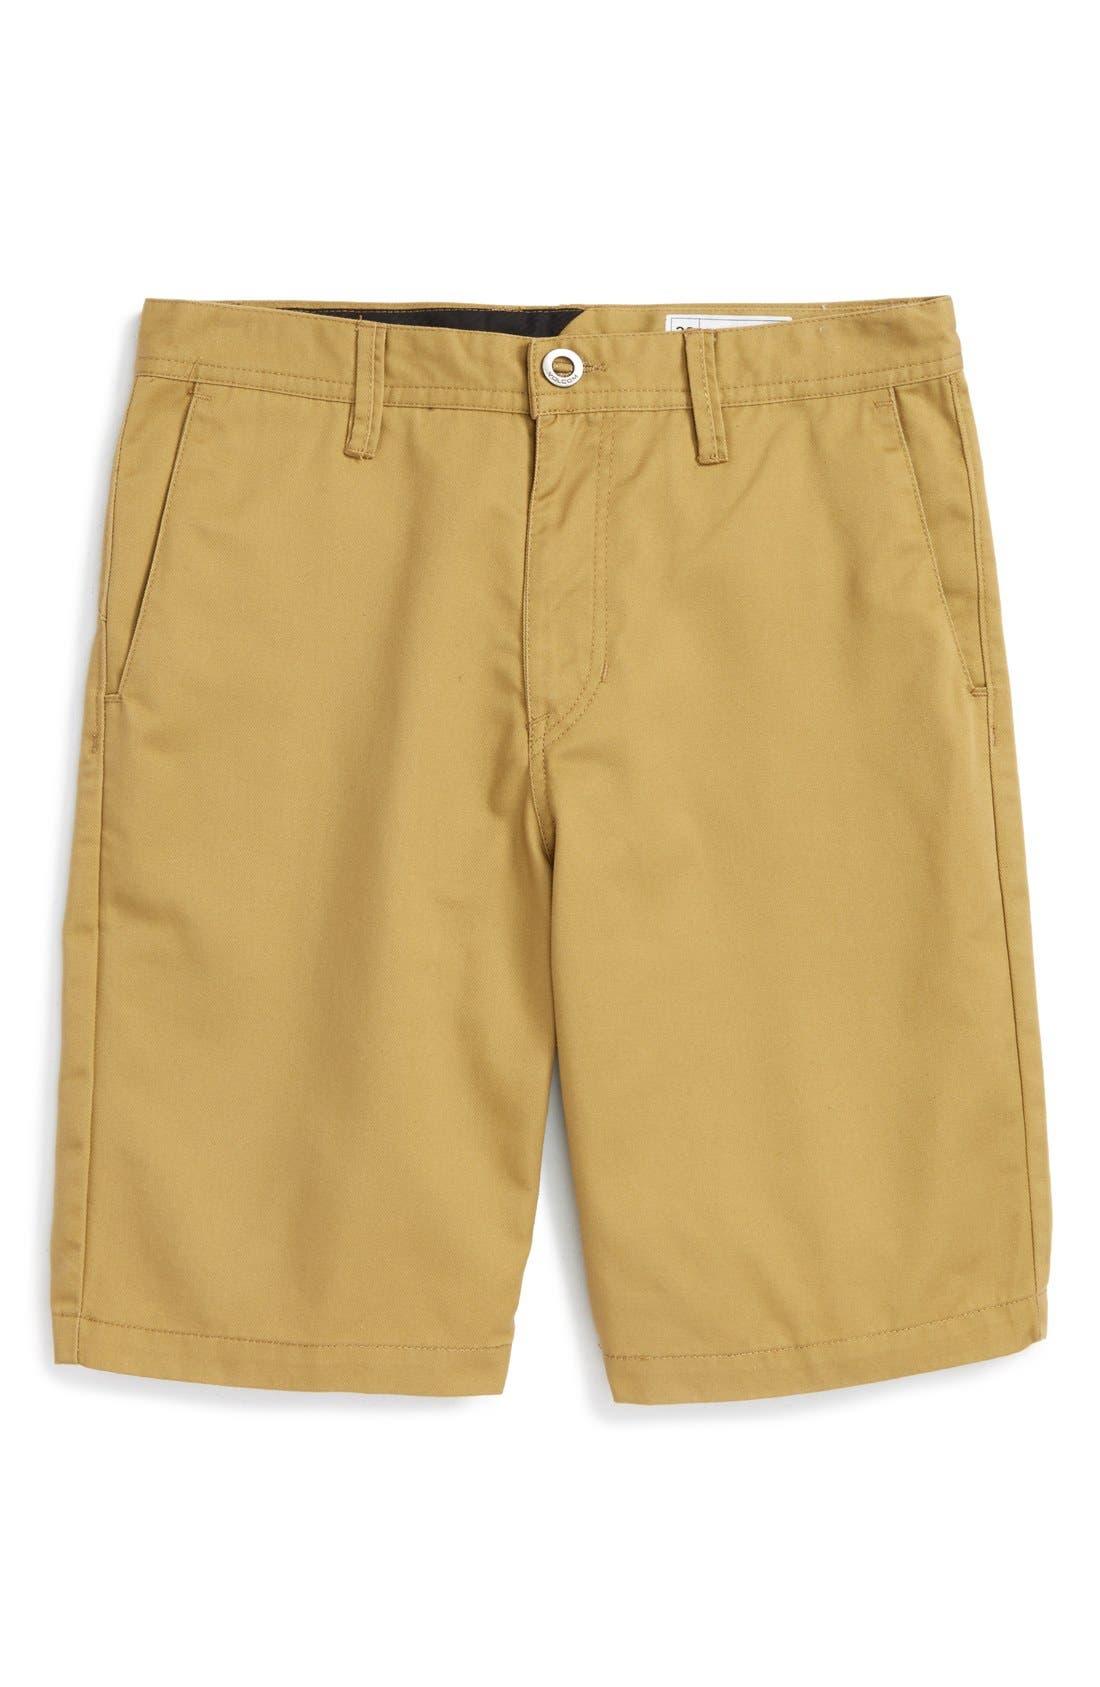 Main Image - Volcom Chino Shorts (Toddler Boys, Little Boys & Big Boys)